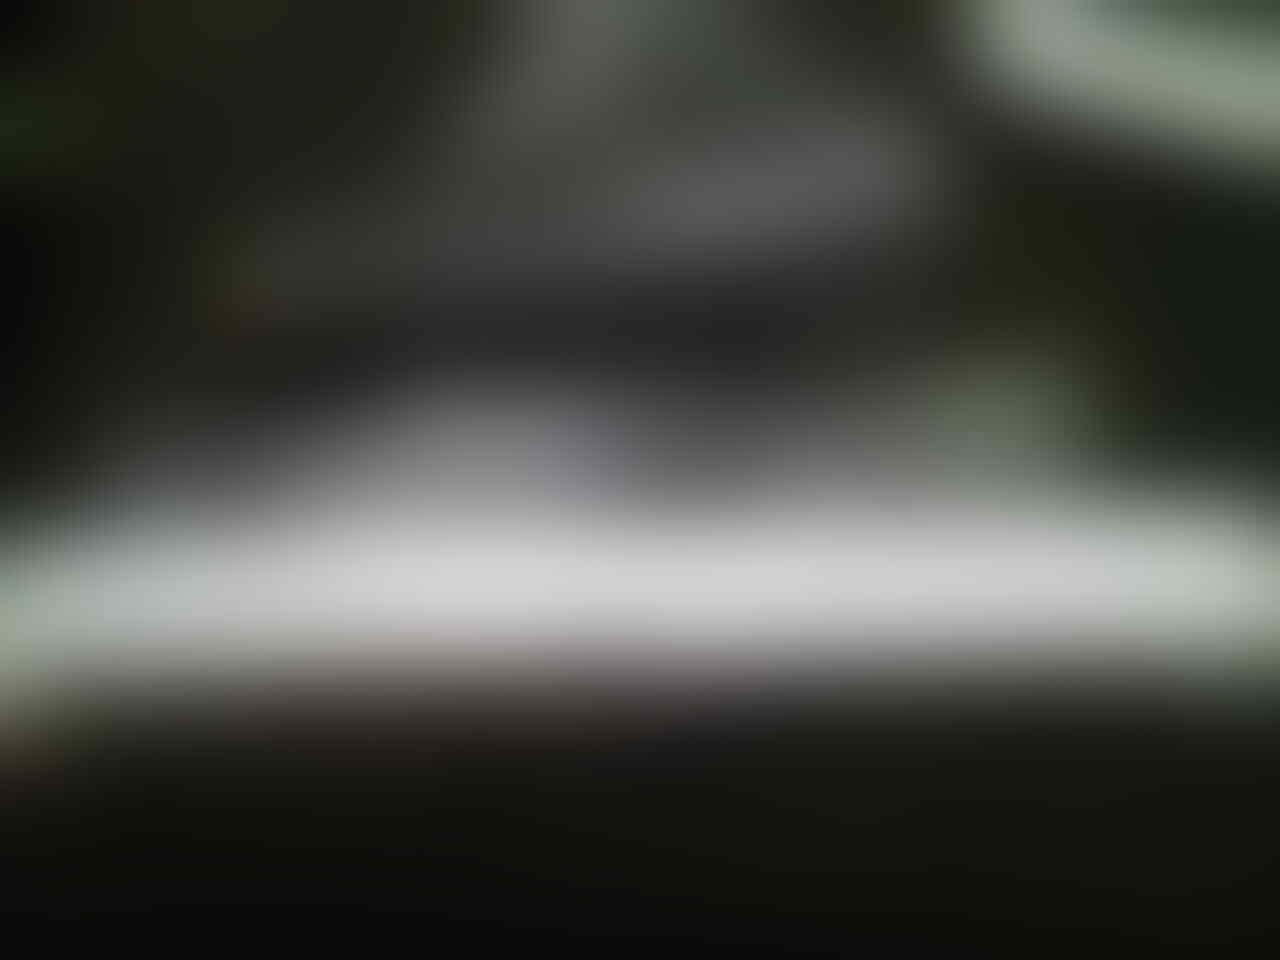 JUAL CEPAT -- Slide PGC KSC Glock 17